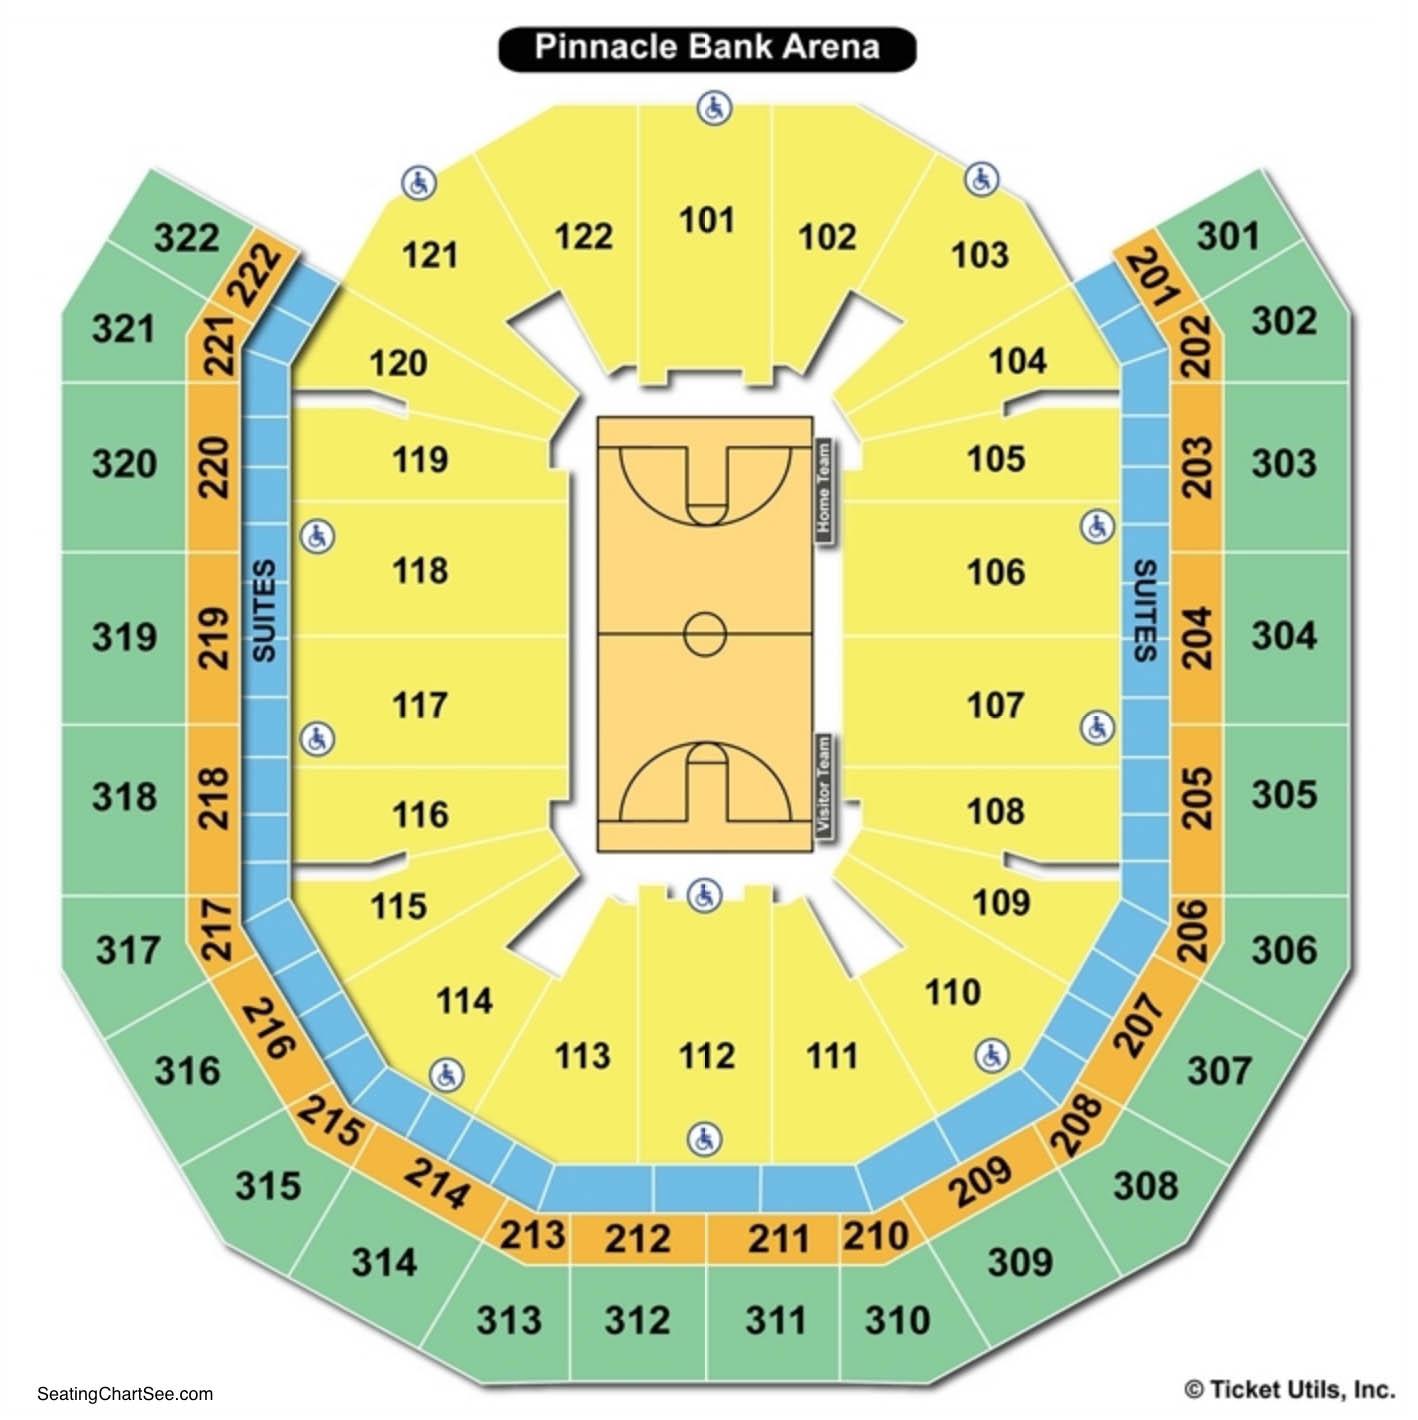 Pinnacle Bank Arena Basketball Seating Chart